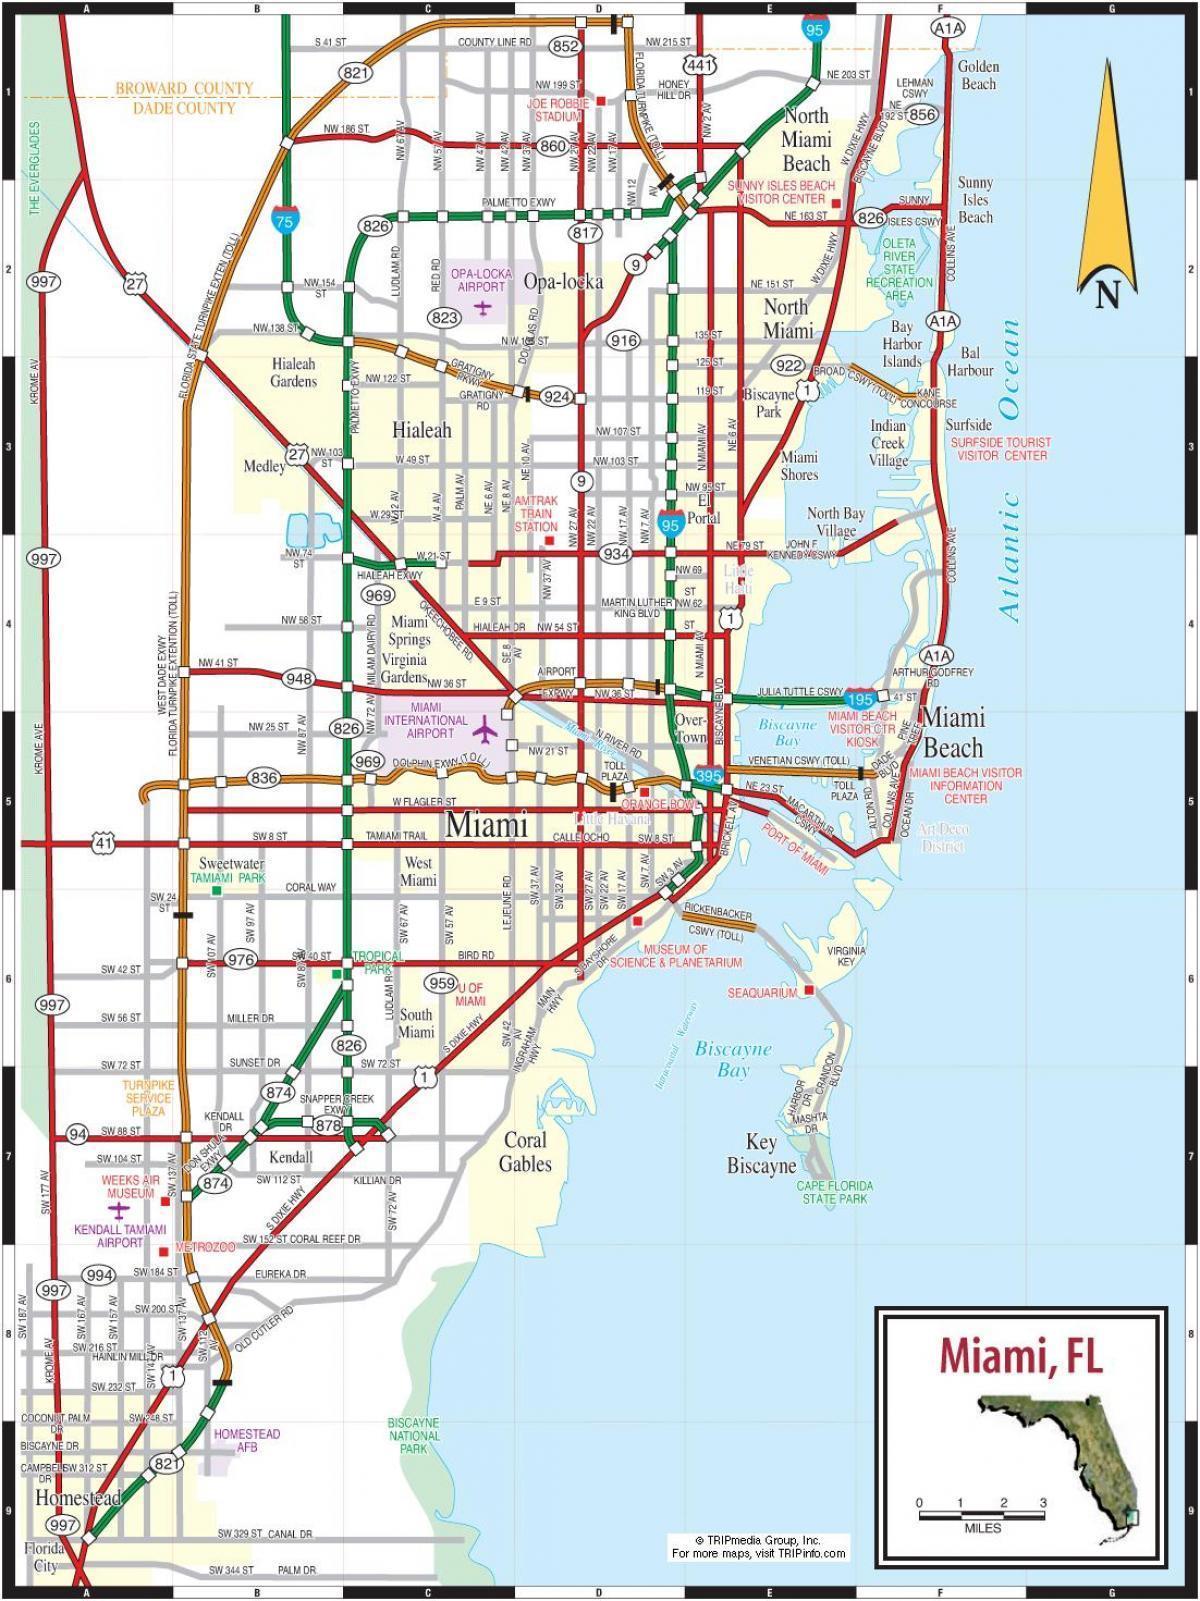 Florida Karte Drucken.Miami Mautstraßen Anzeigen Mautstraßen In Miami Karte Florida Usa